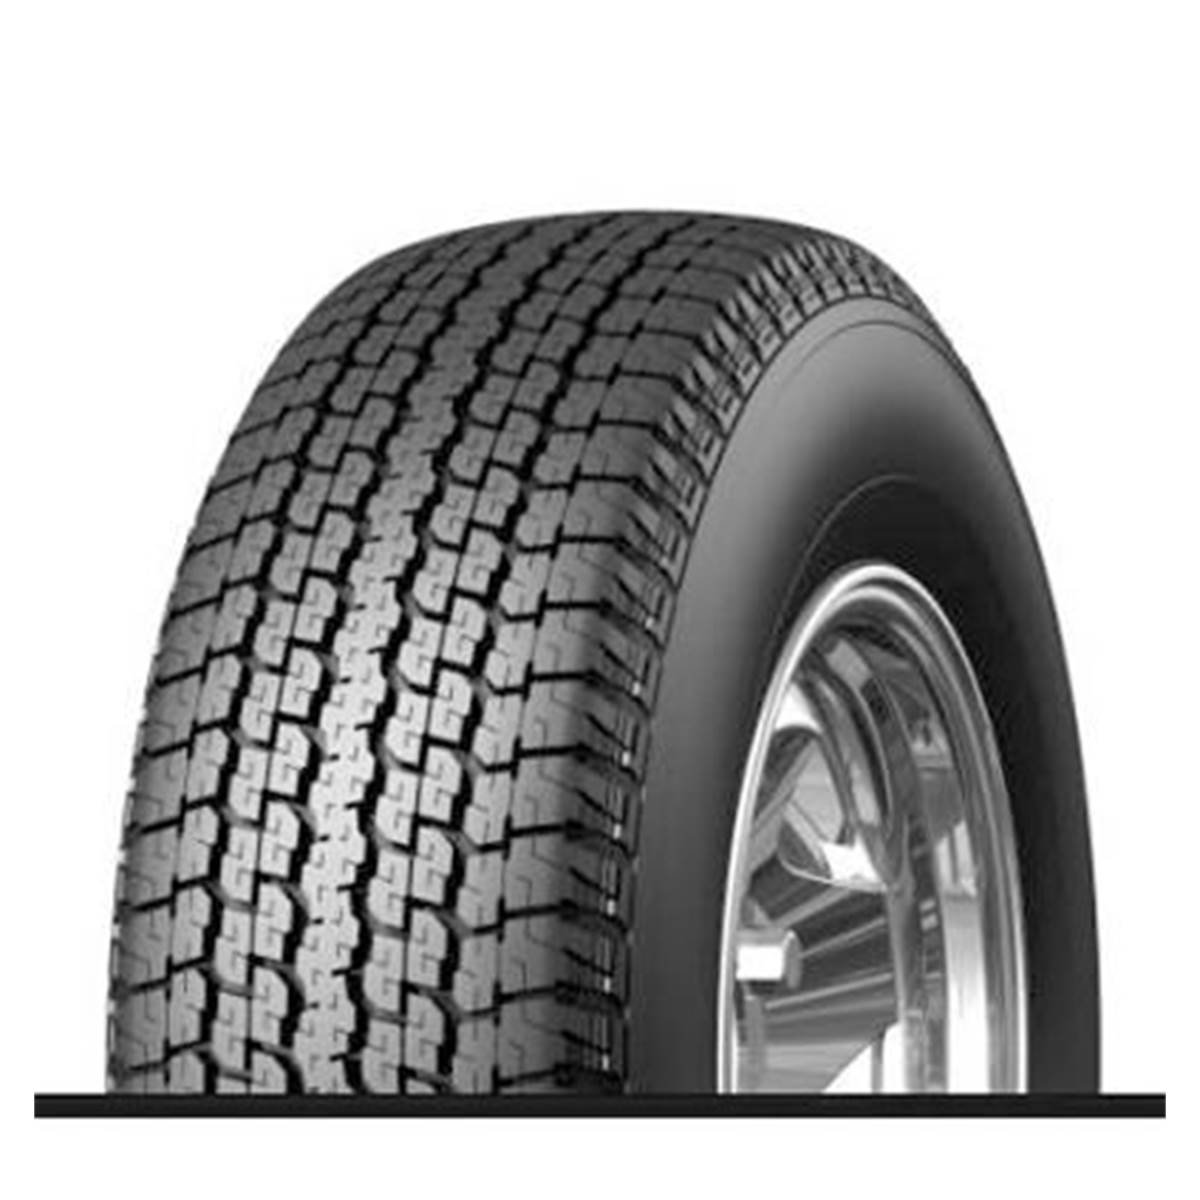 Pneu Bridgestone 225/70X17 108 S DUELE D840 XL